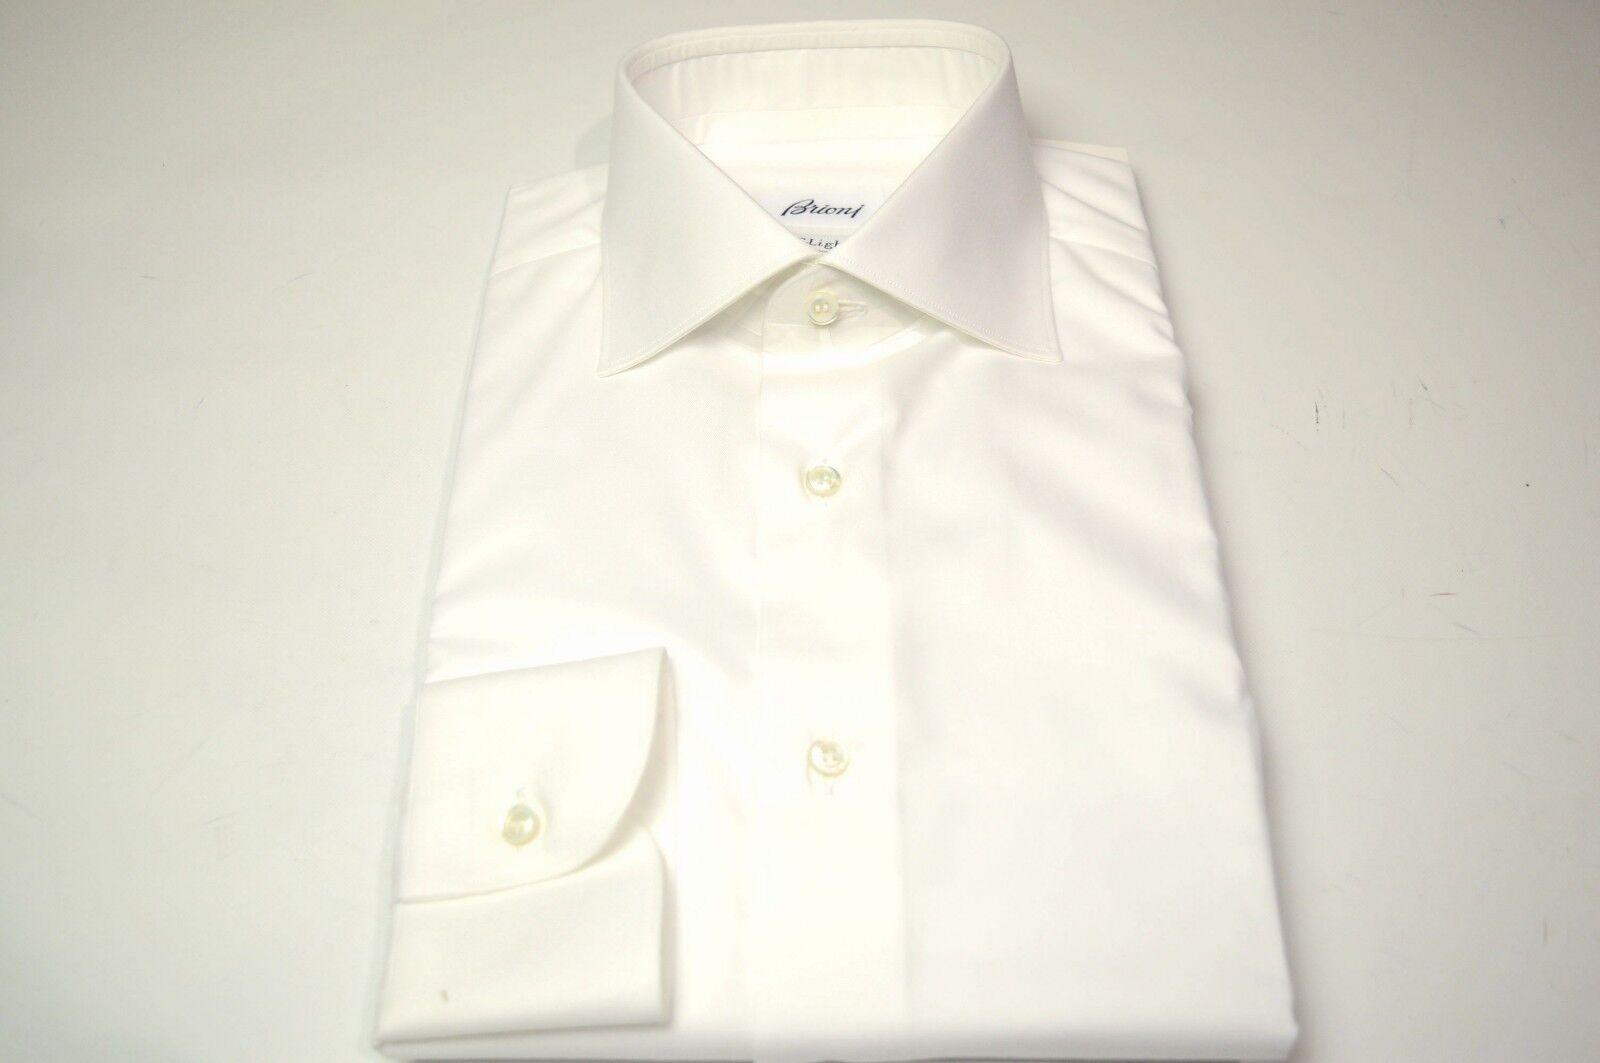 NEW BRIONI White Dress SHIRT 100% Cotton Size 17 Us 43 Eu  (SE38)